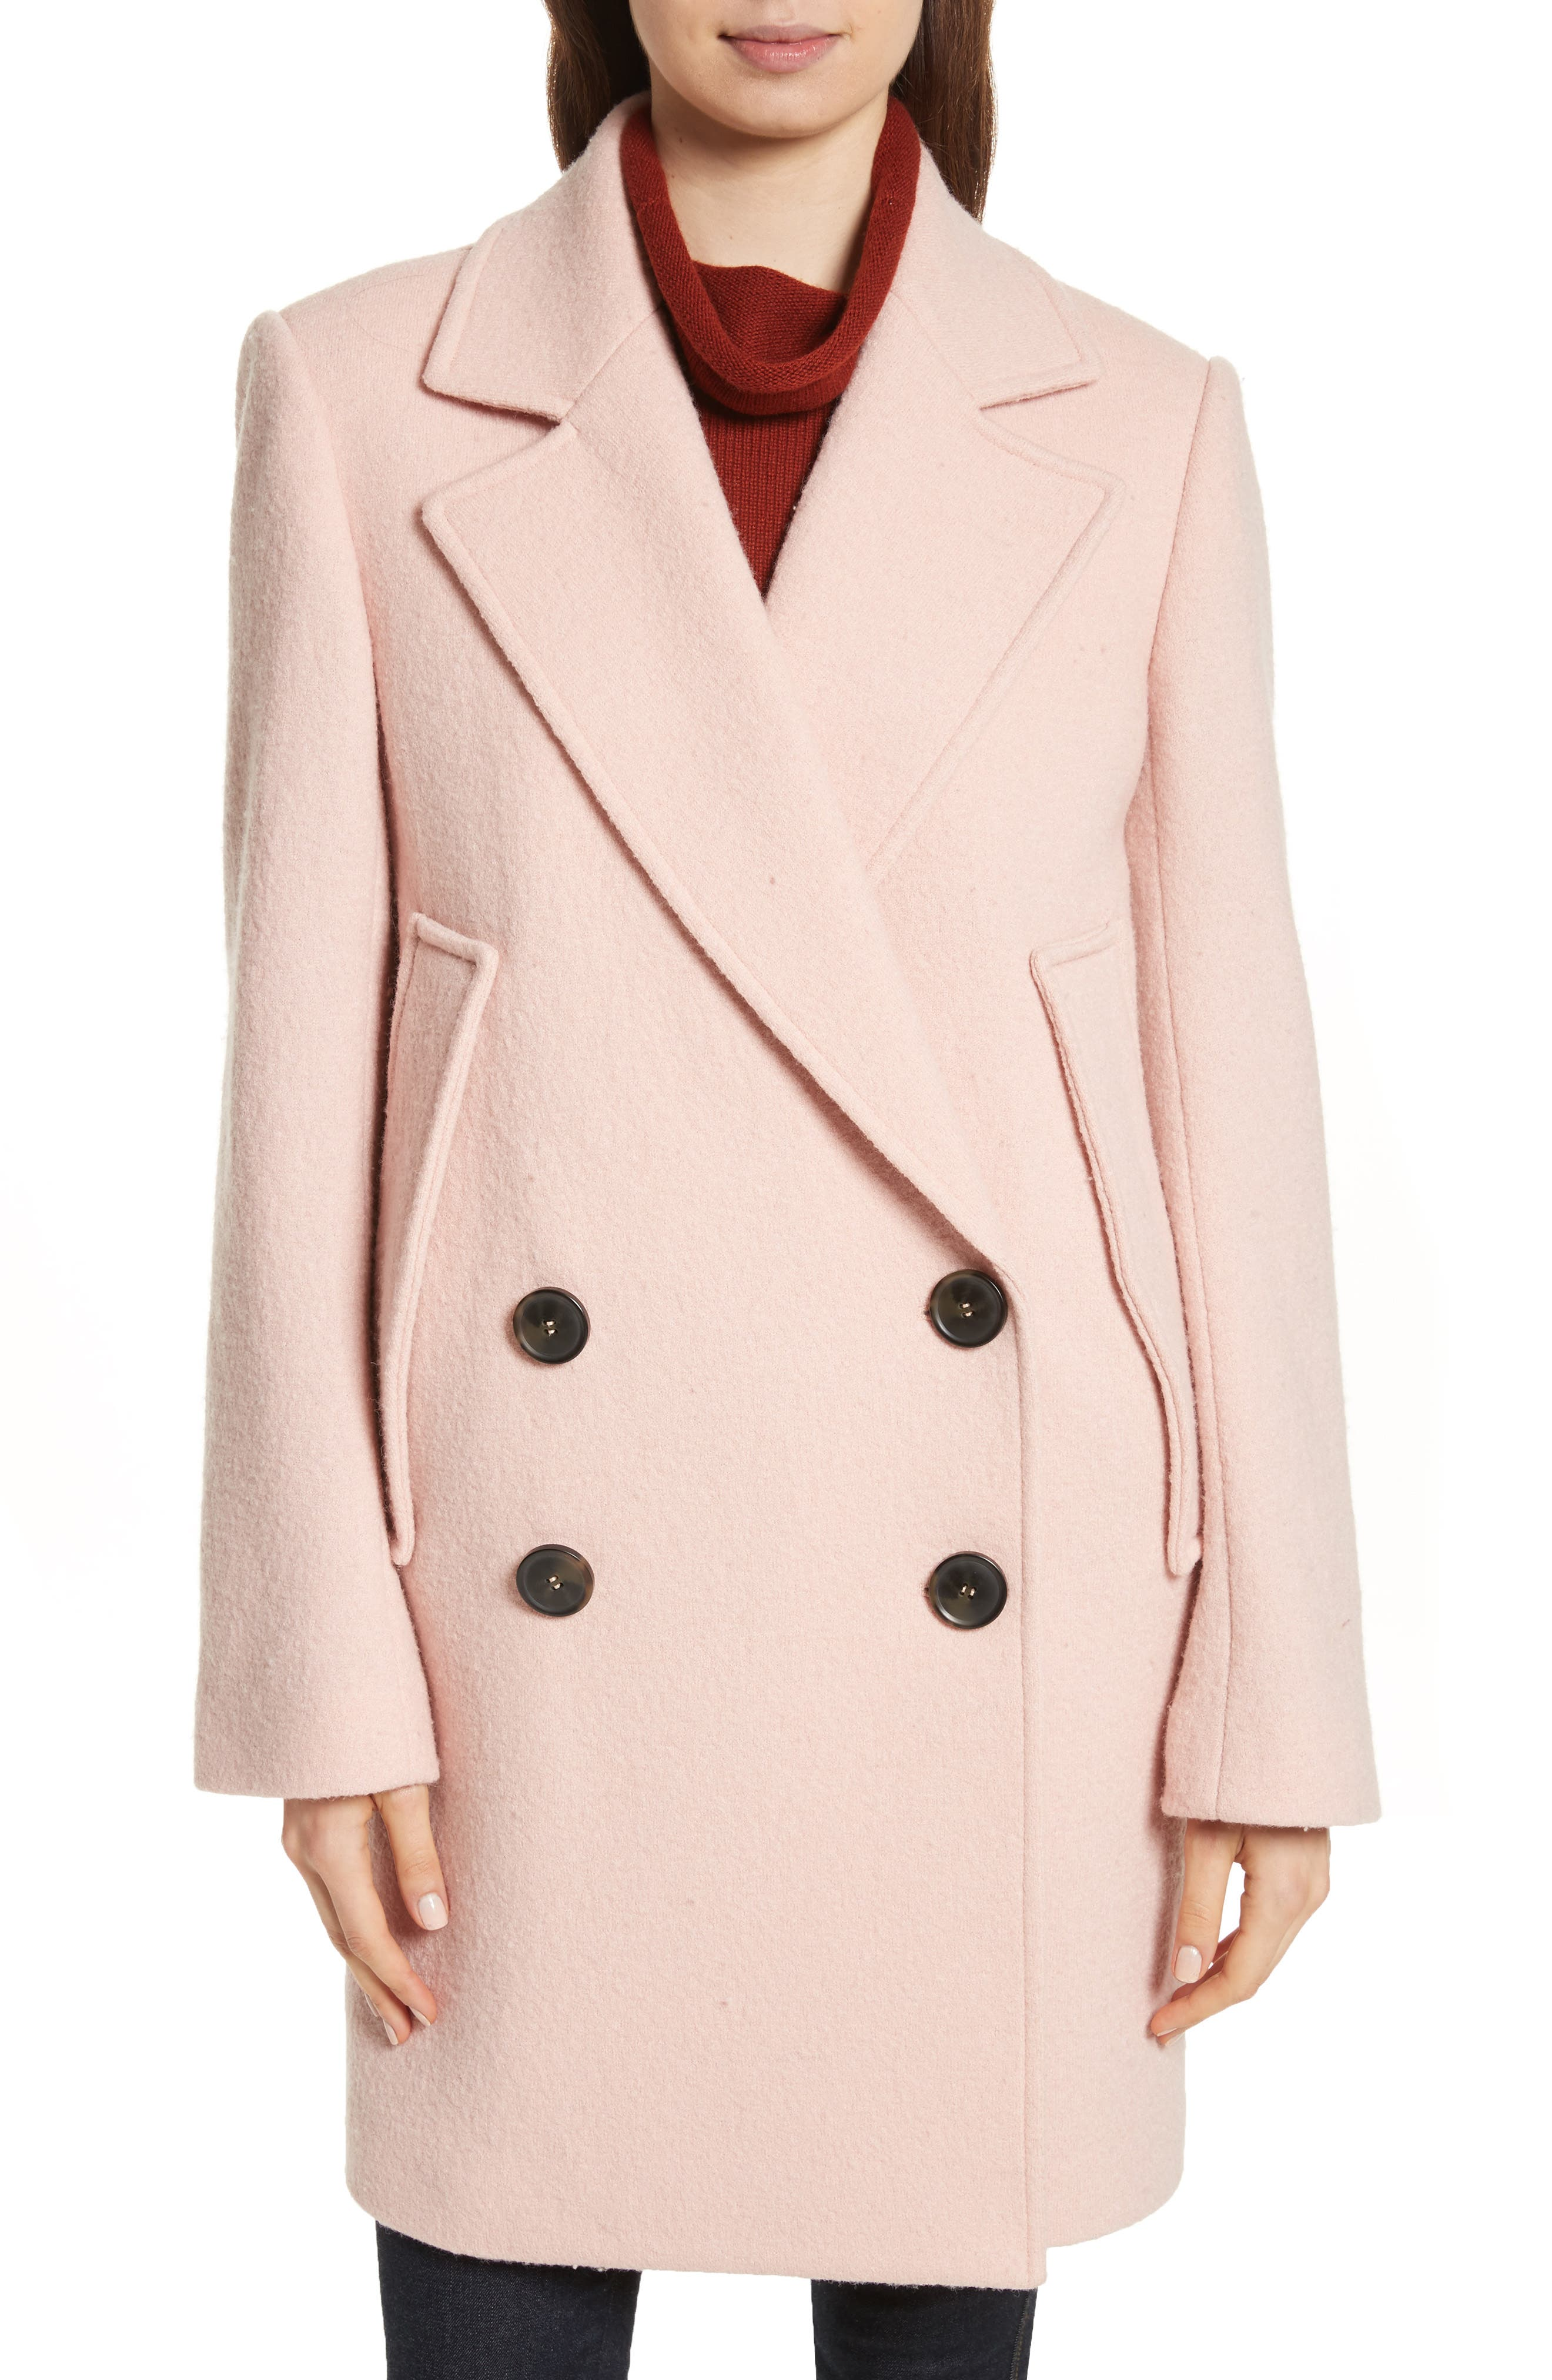 Alternate Image 1 Selected - Theory Wool Bouclé Coat